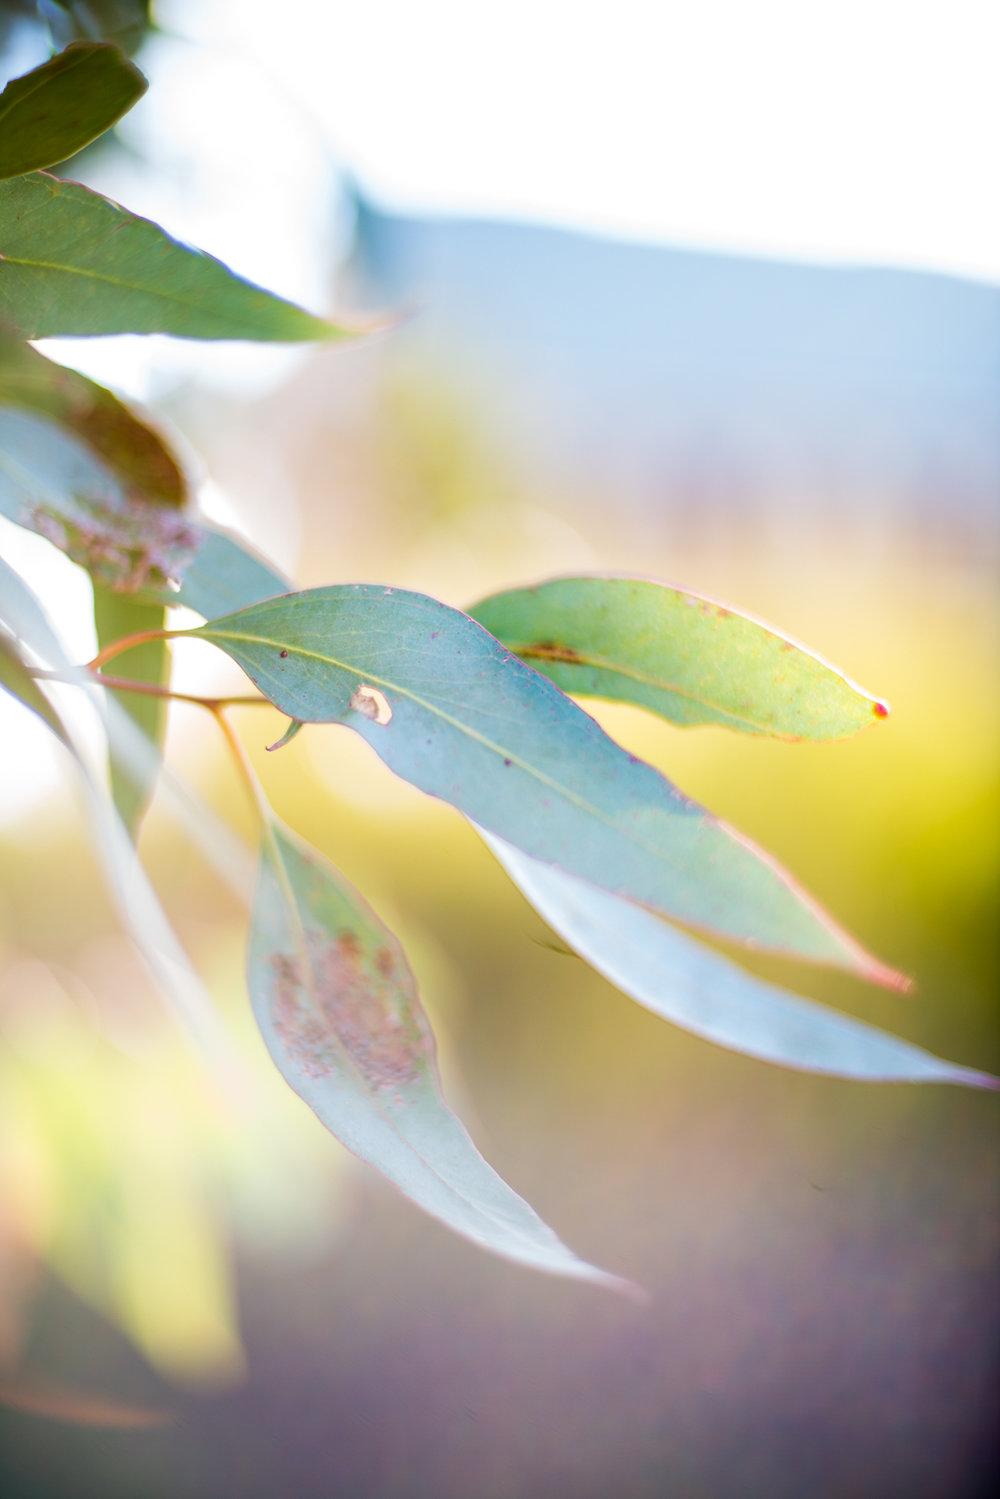 cindycavanagh-sydneyphotographer-longgrass (40 of 47).JPG